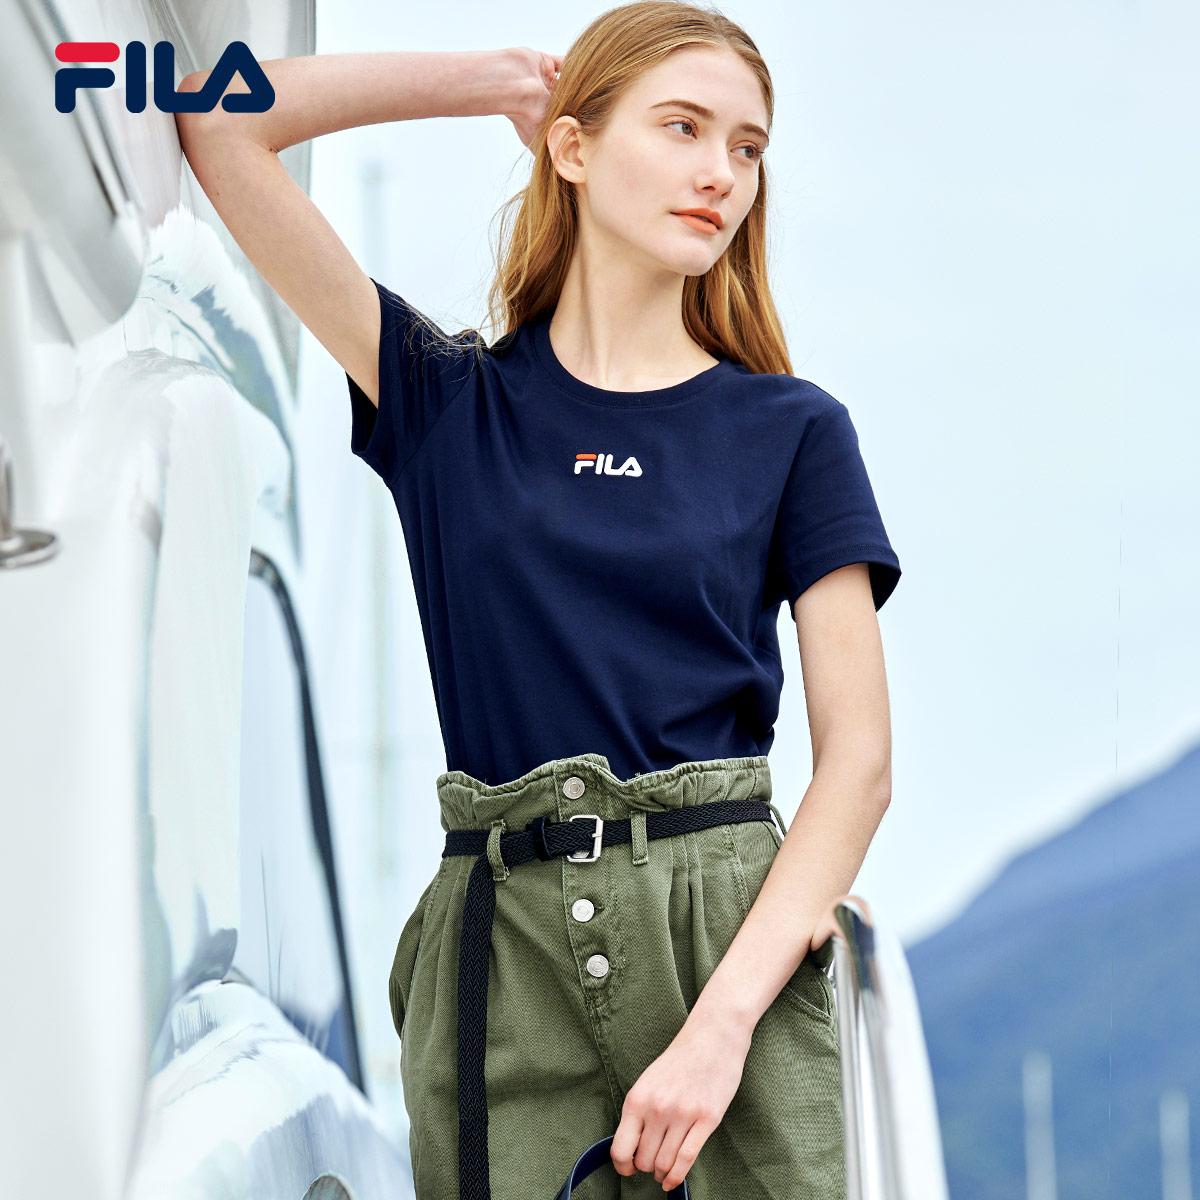 FILA斐乐官方短袖t恤女2020夏季新款短袖女ins潮休闲运动t恤